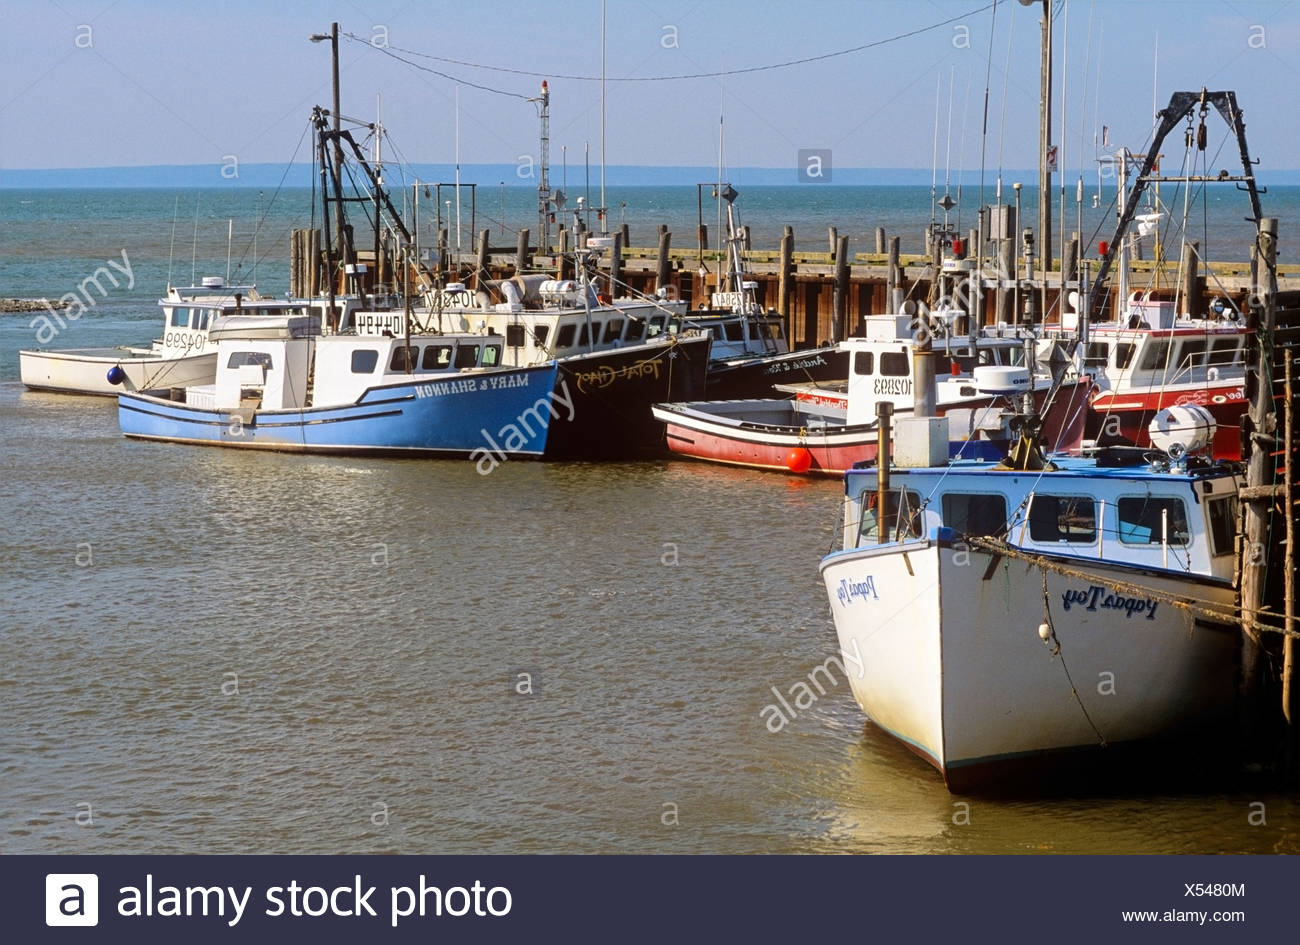 Fishing boats docked at high tide, Alma, Bay of Fundy, New